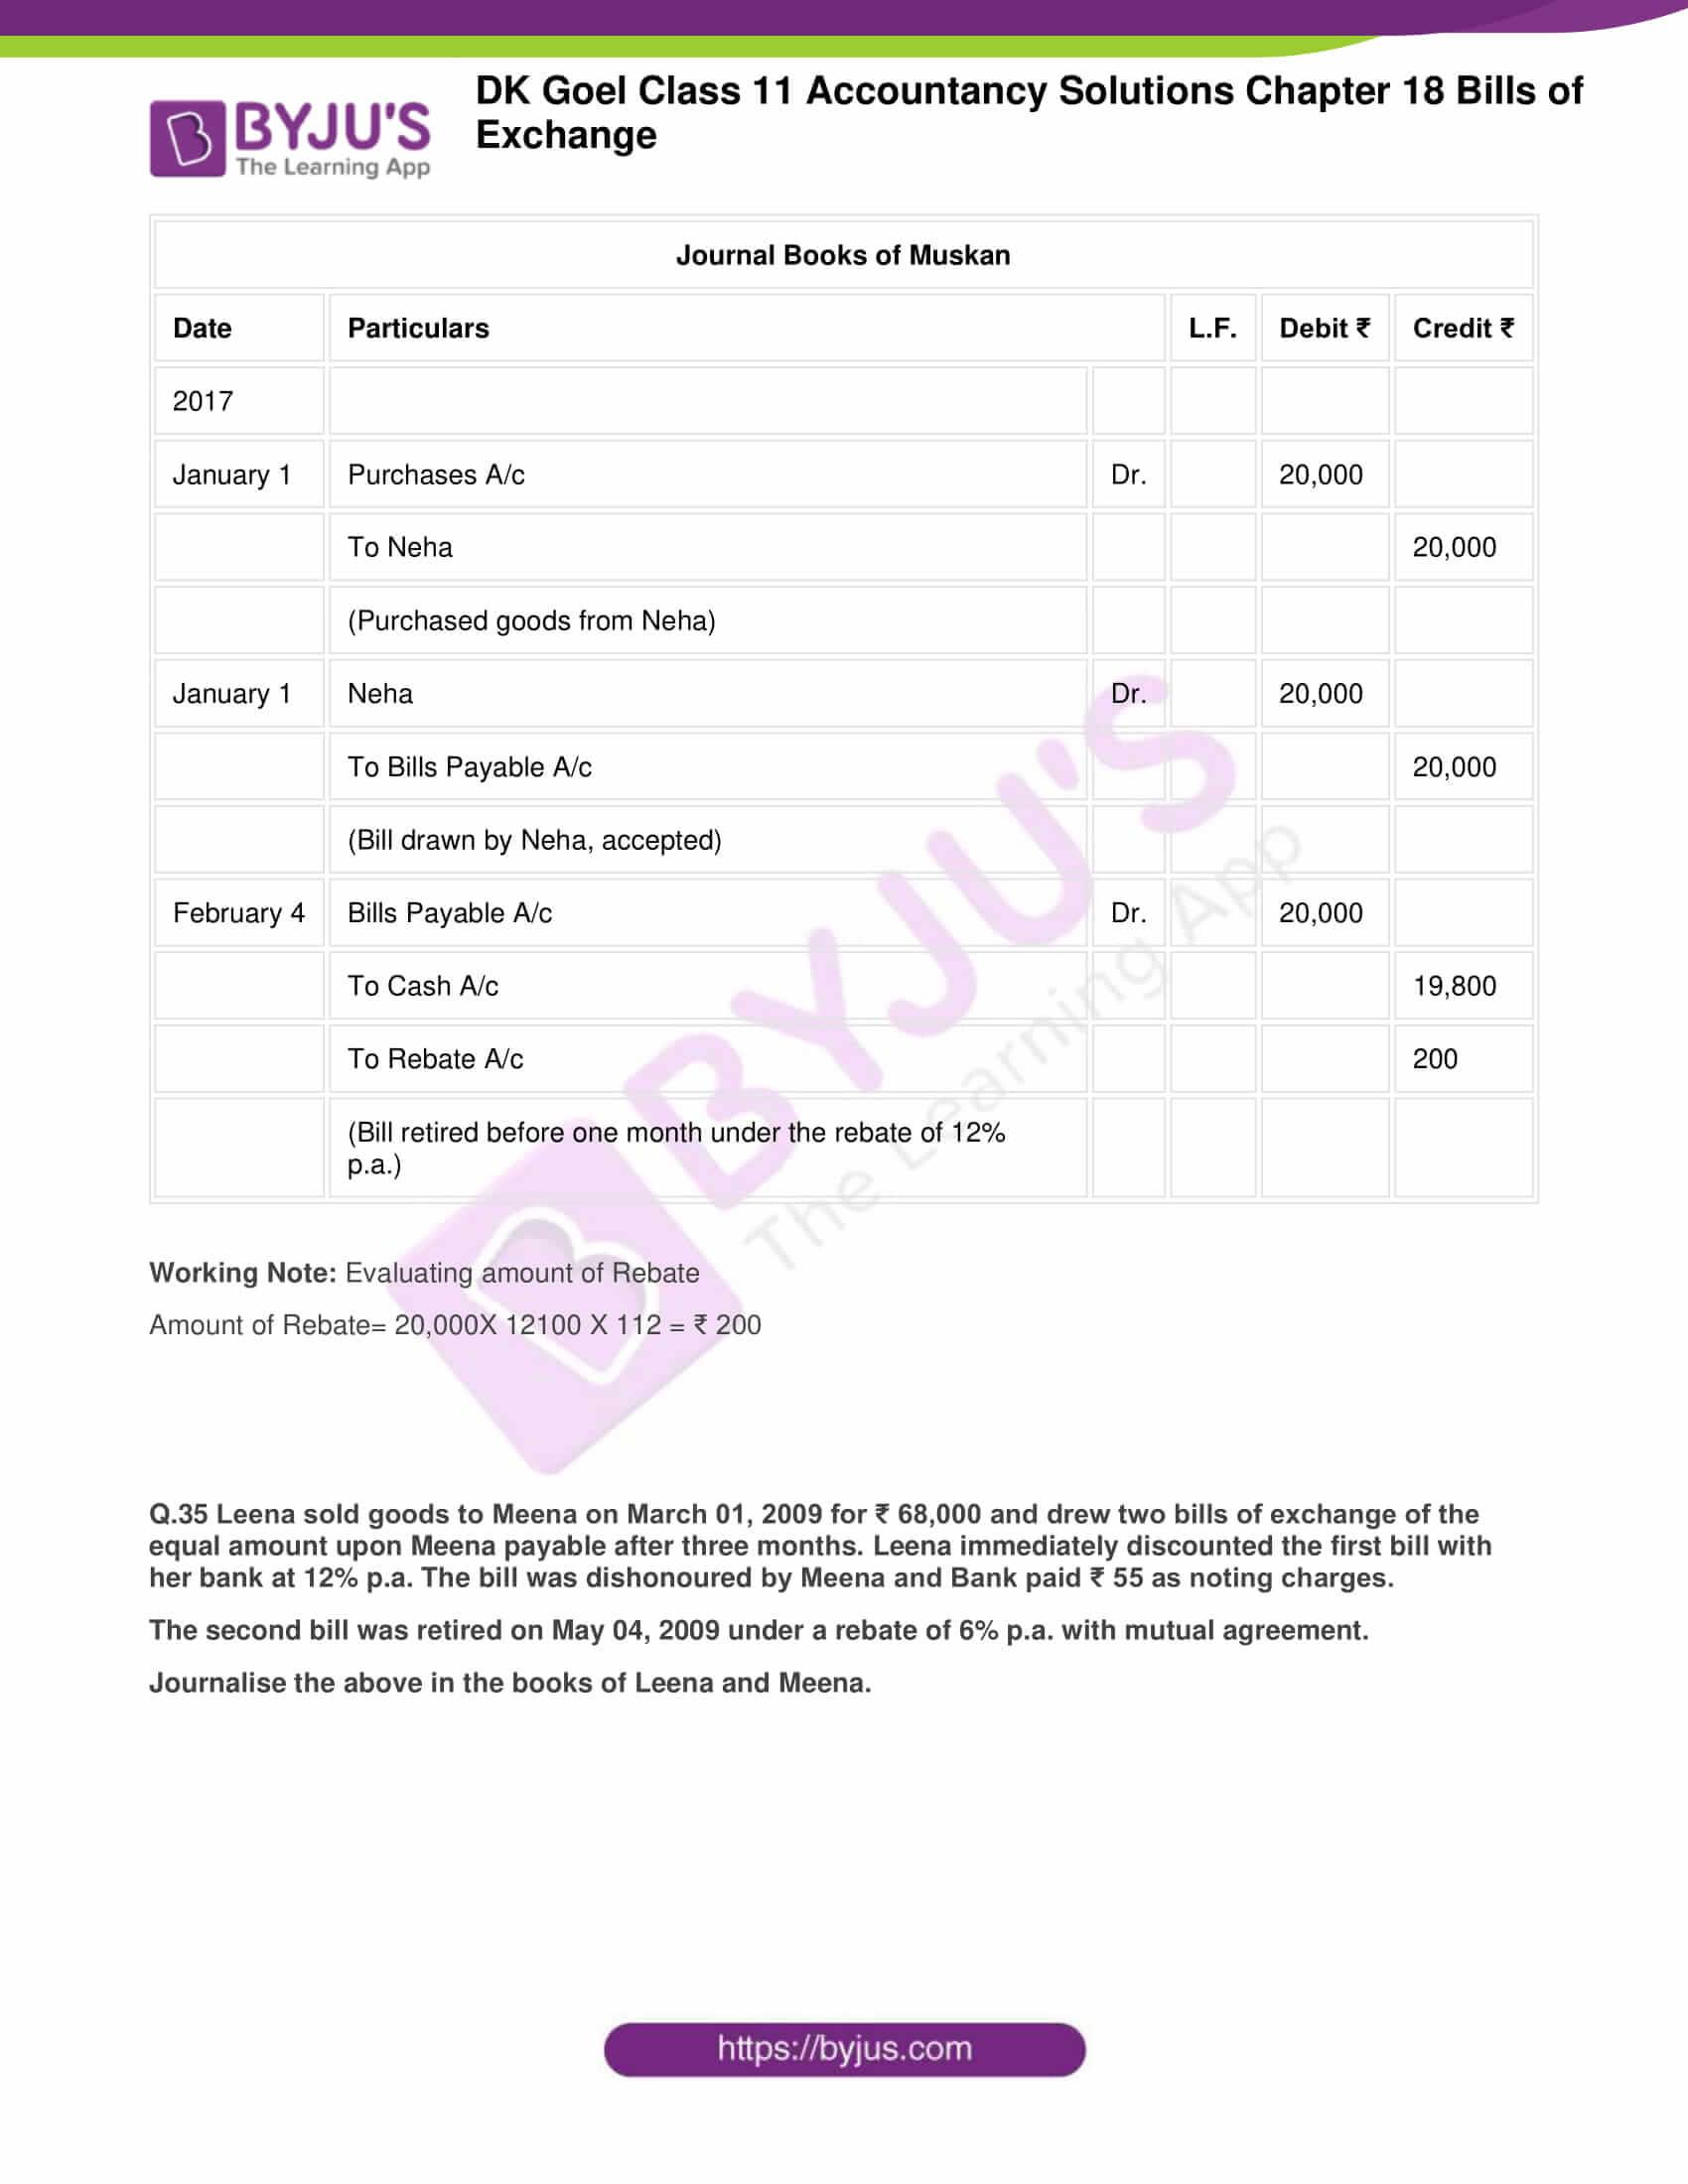 dk goel class 11 accountancy solutions chapter 18 085